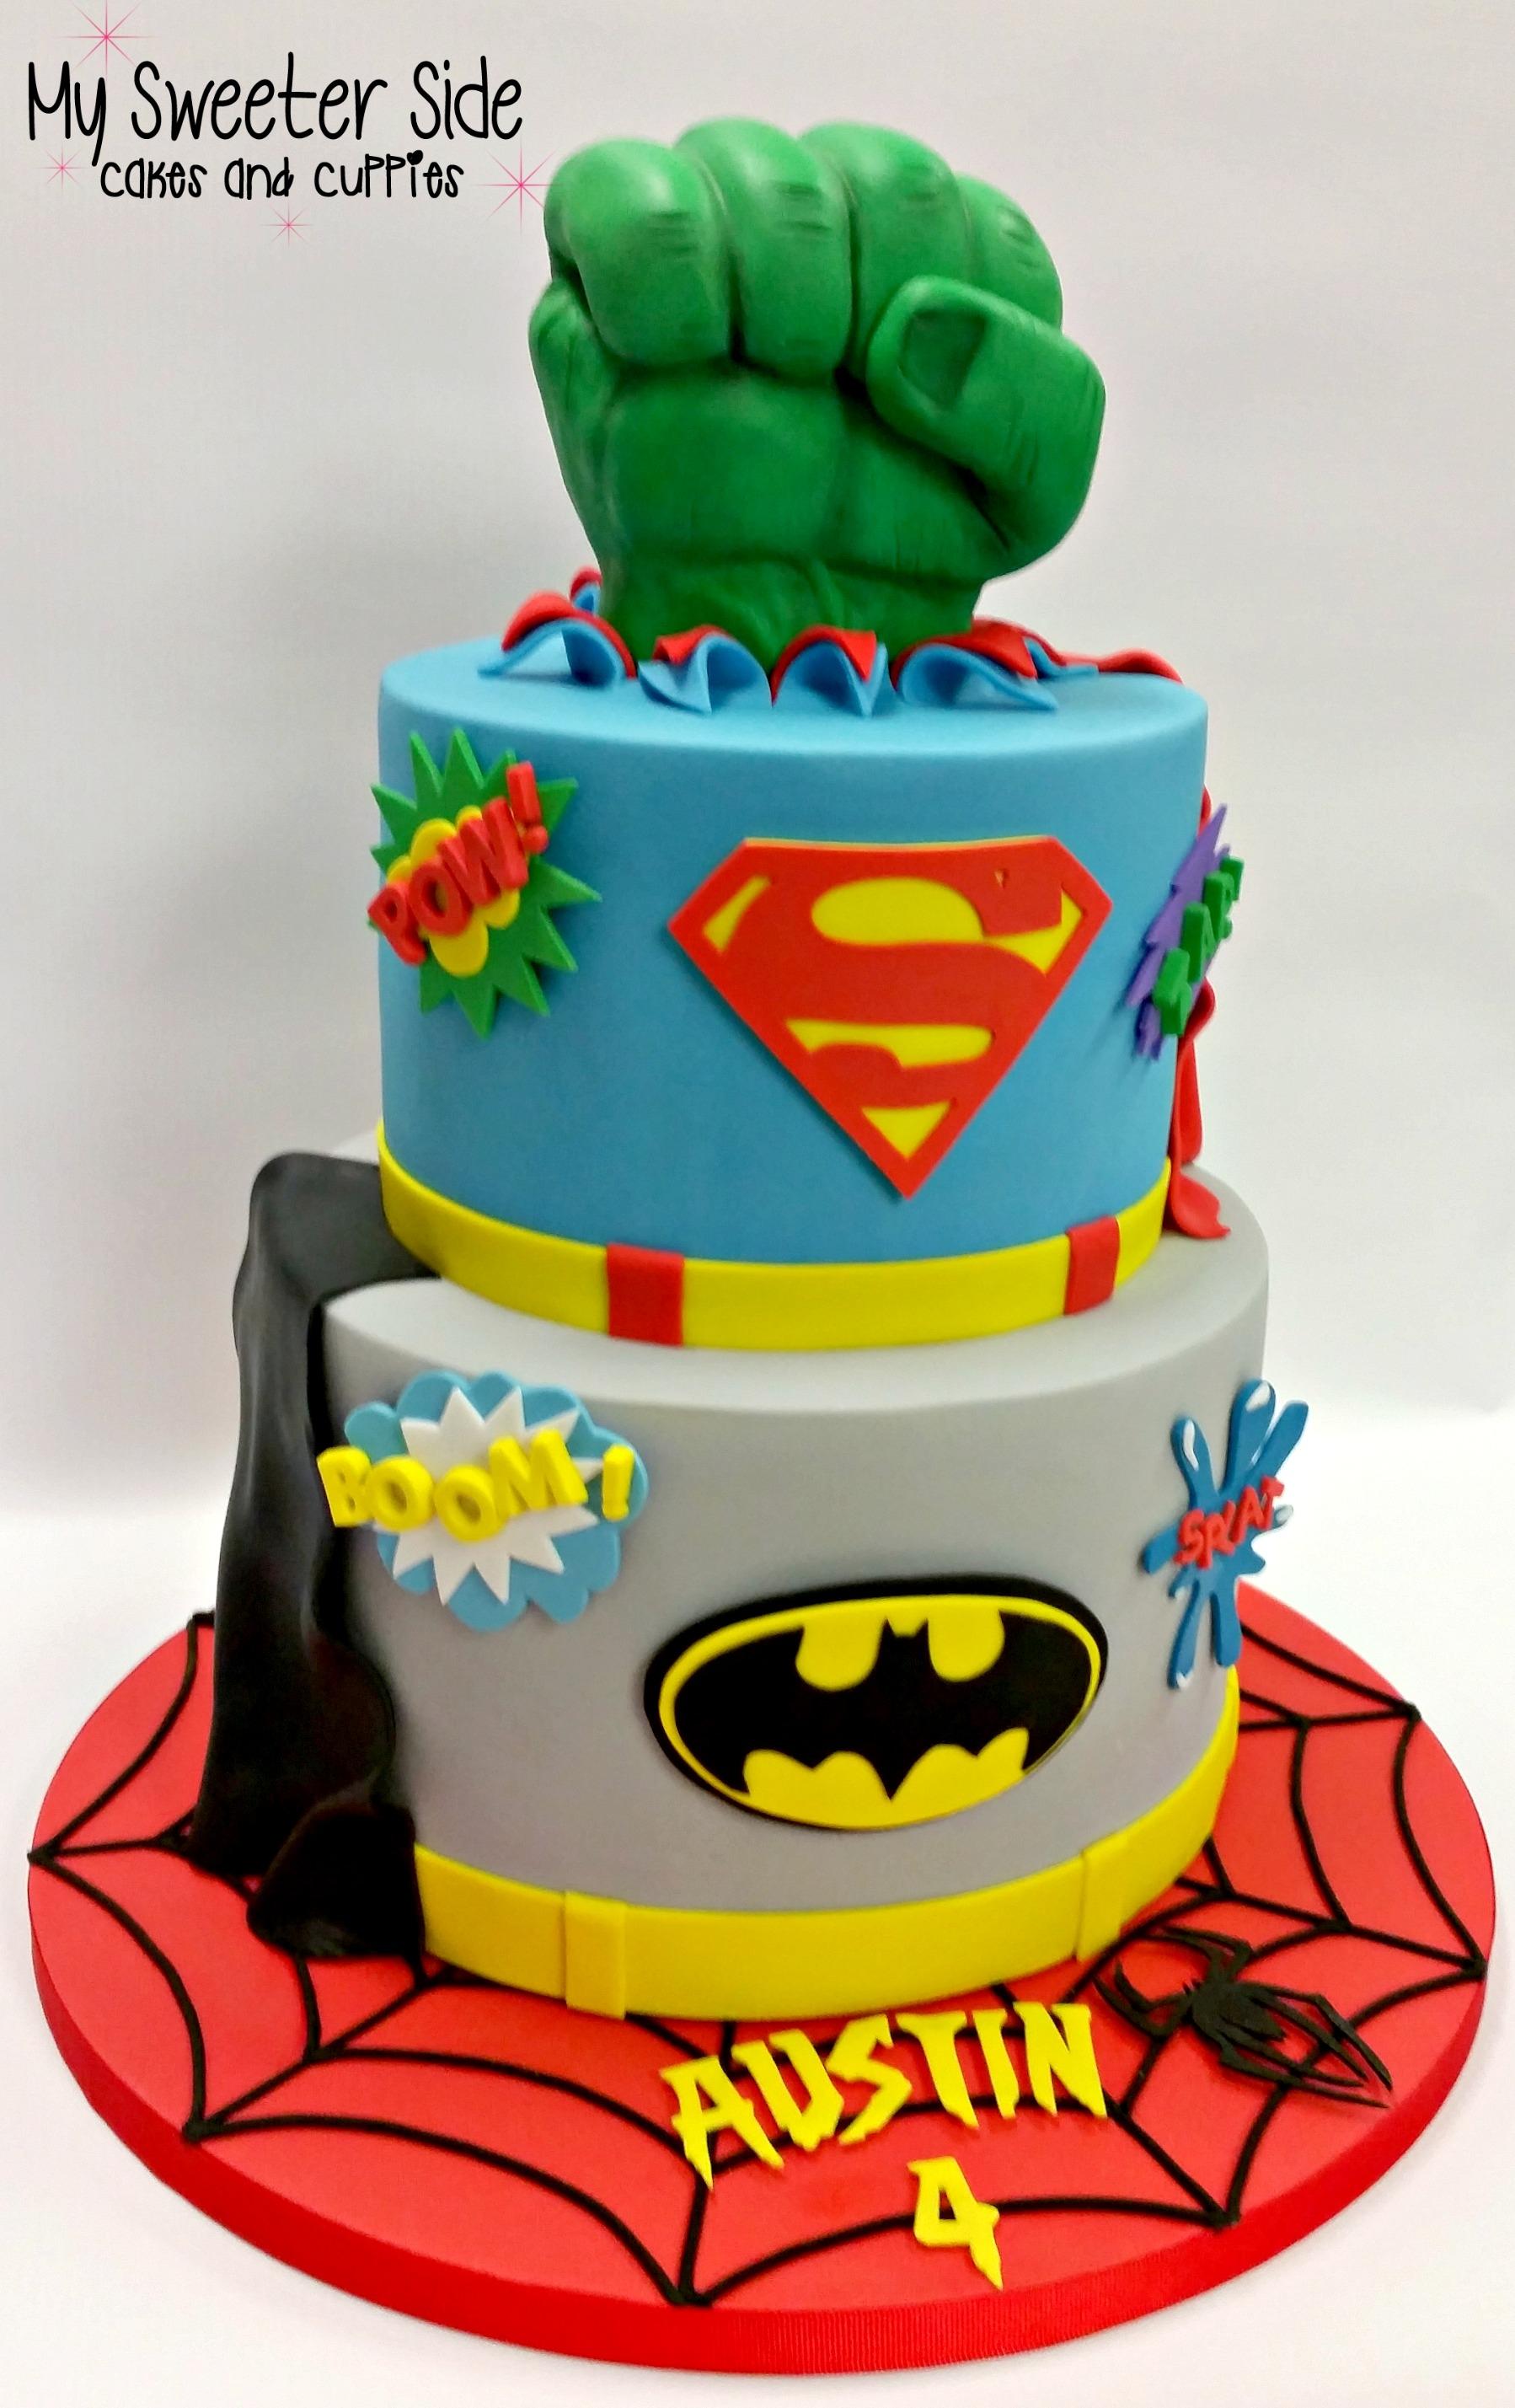 Easy super hero birthday cake with printable cake toppers ...  |Superhero Cakes